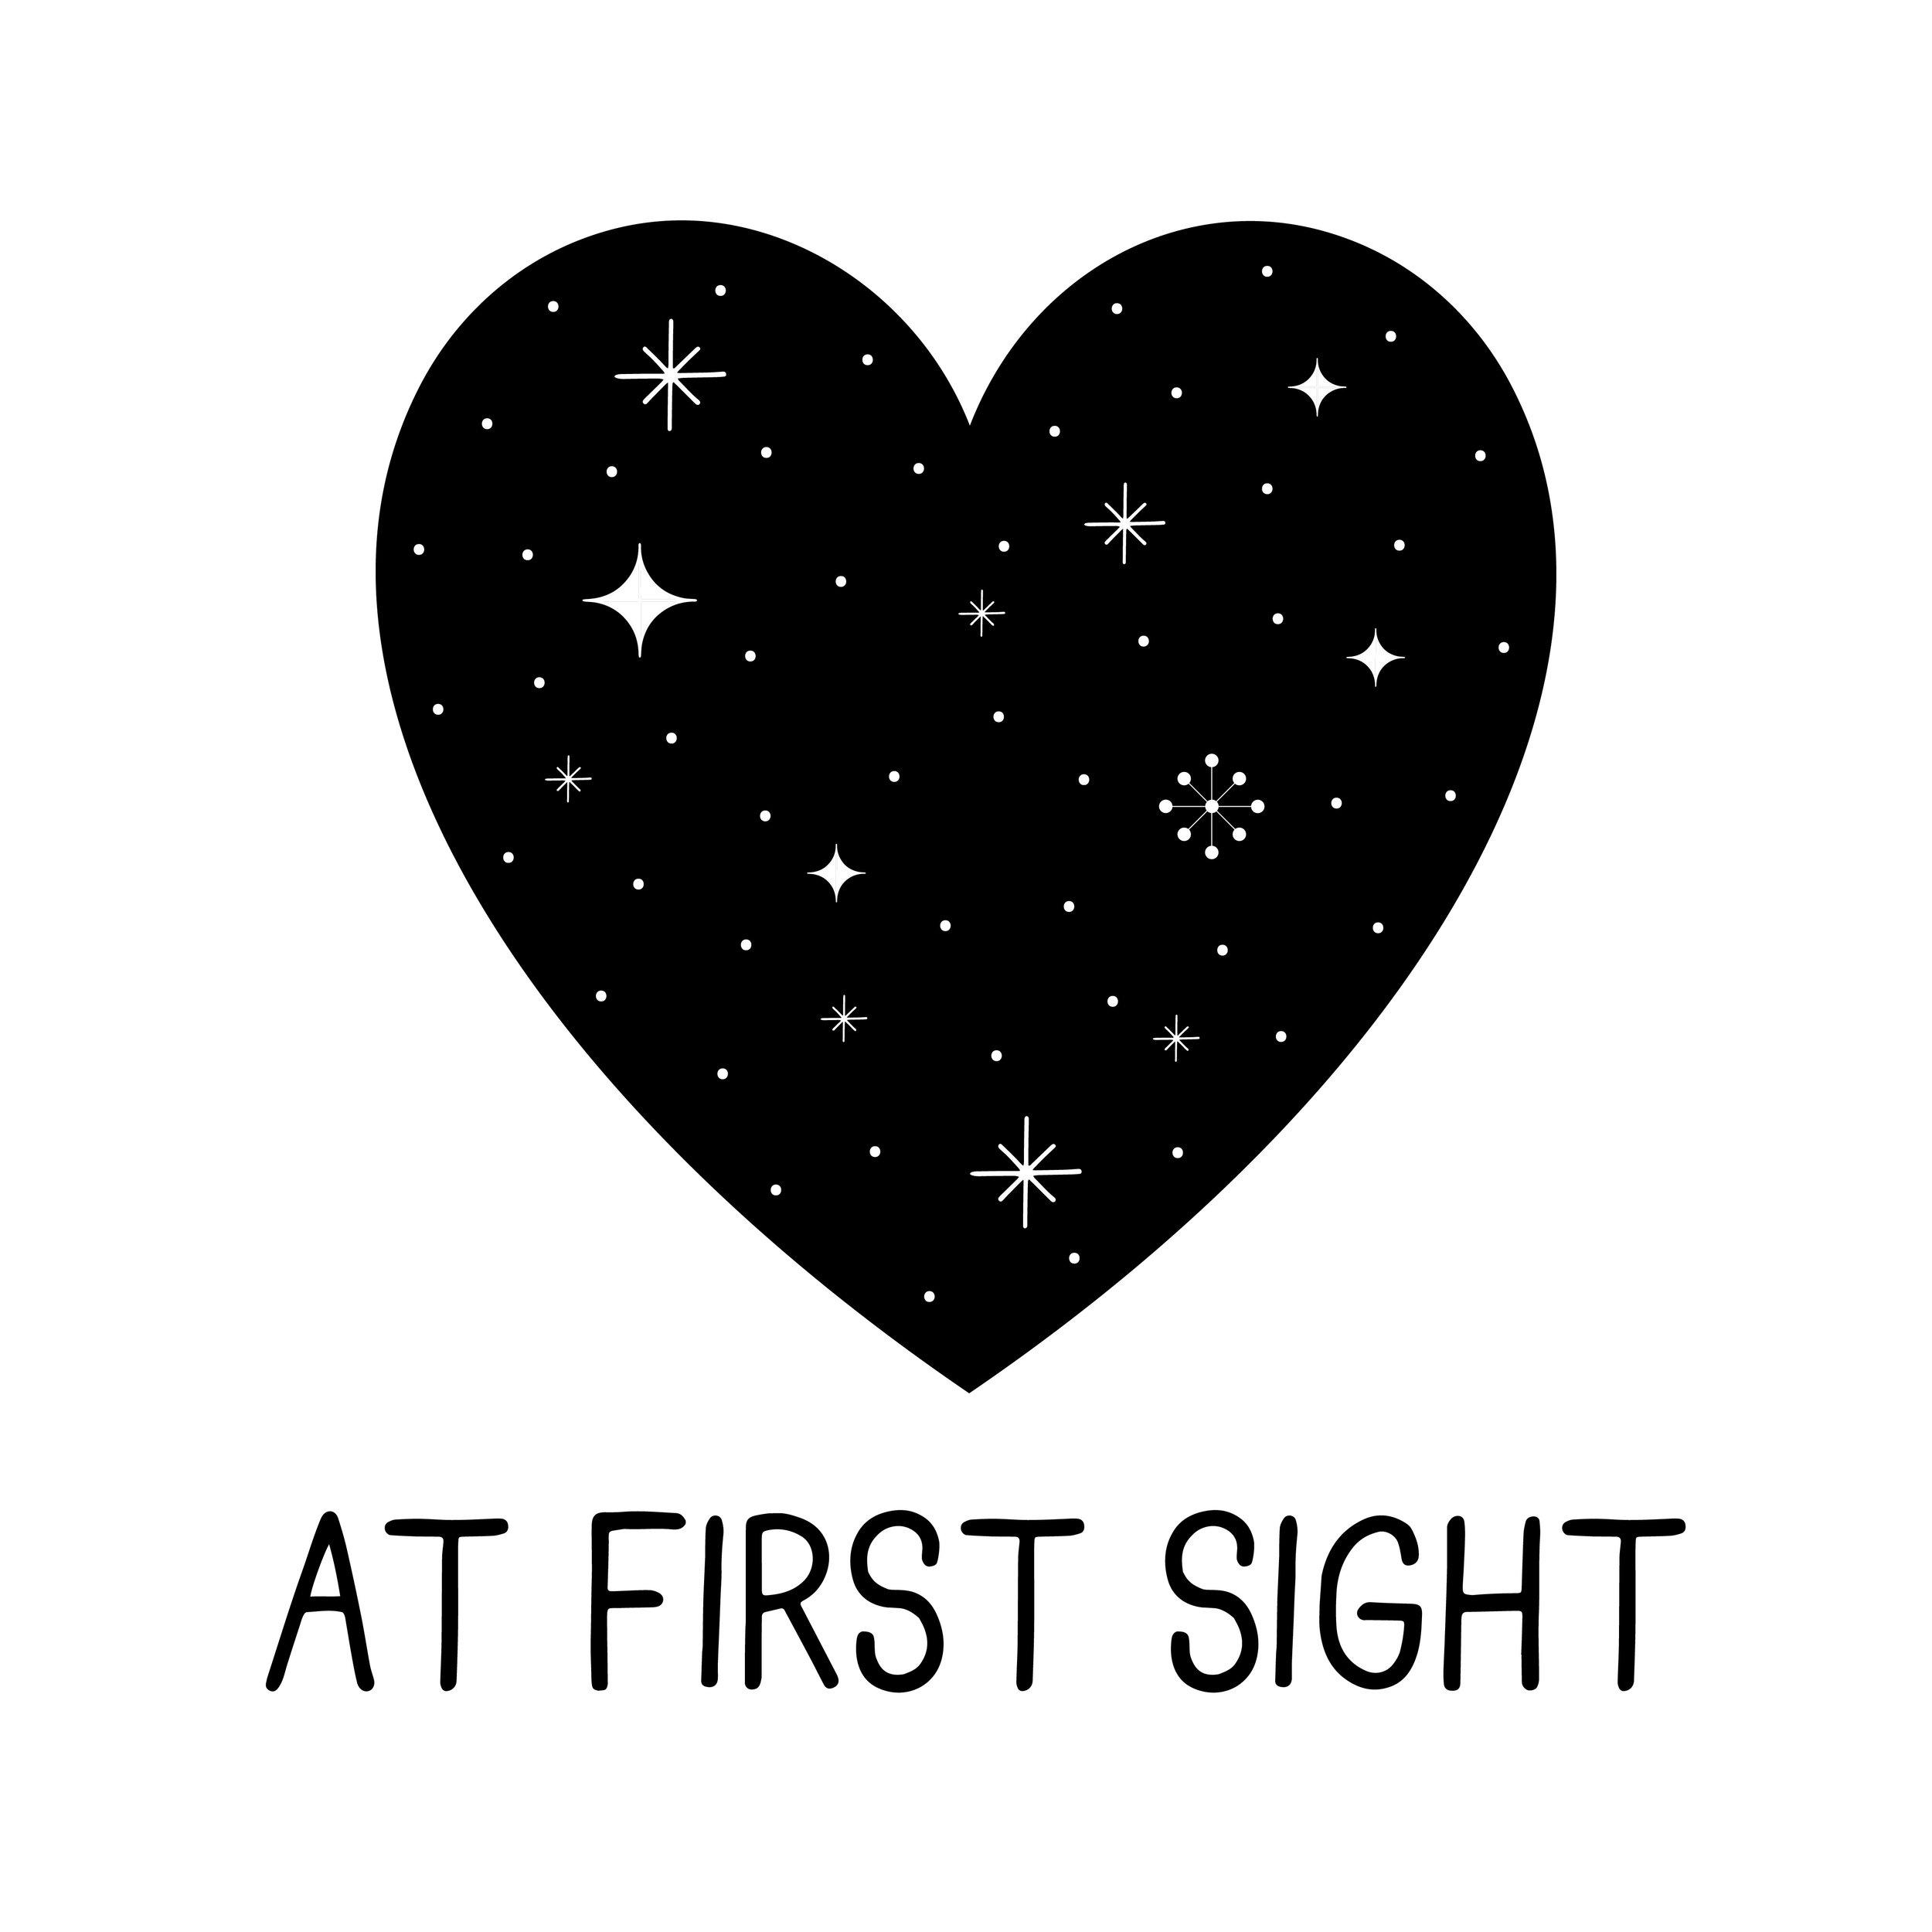 atfirstsight-01.jpg